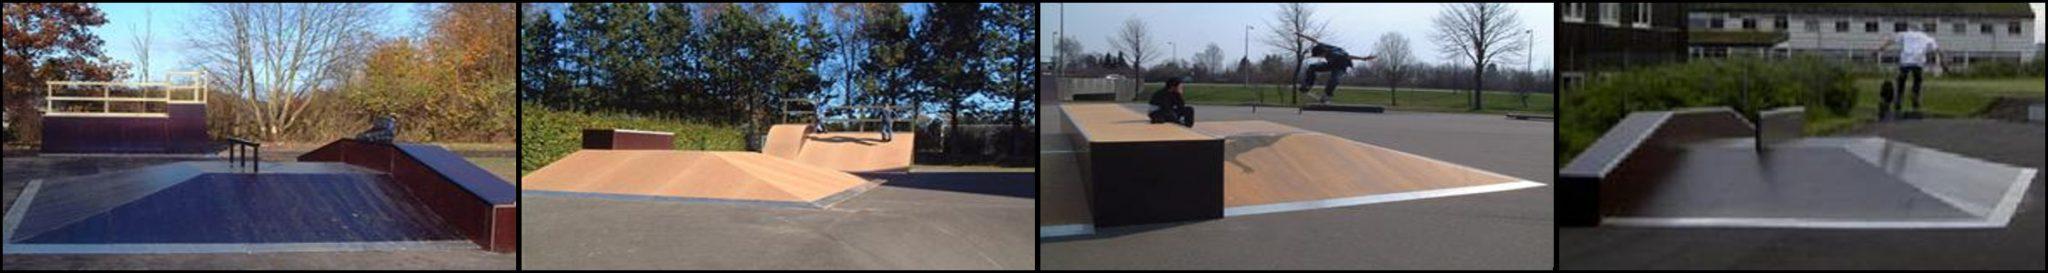 skateboard pyramide